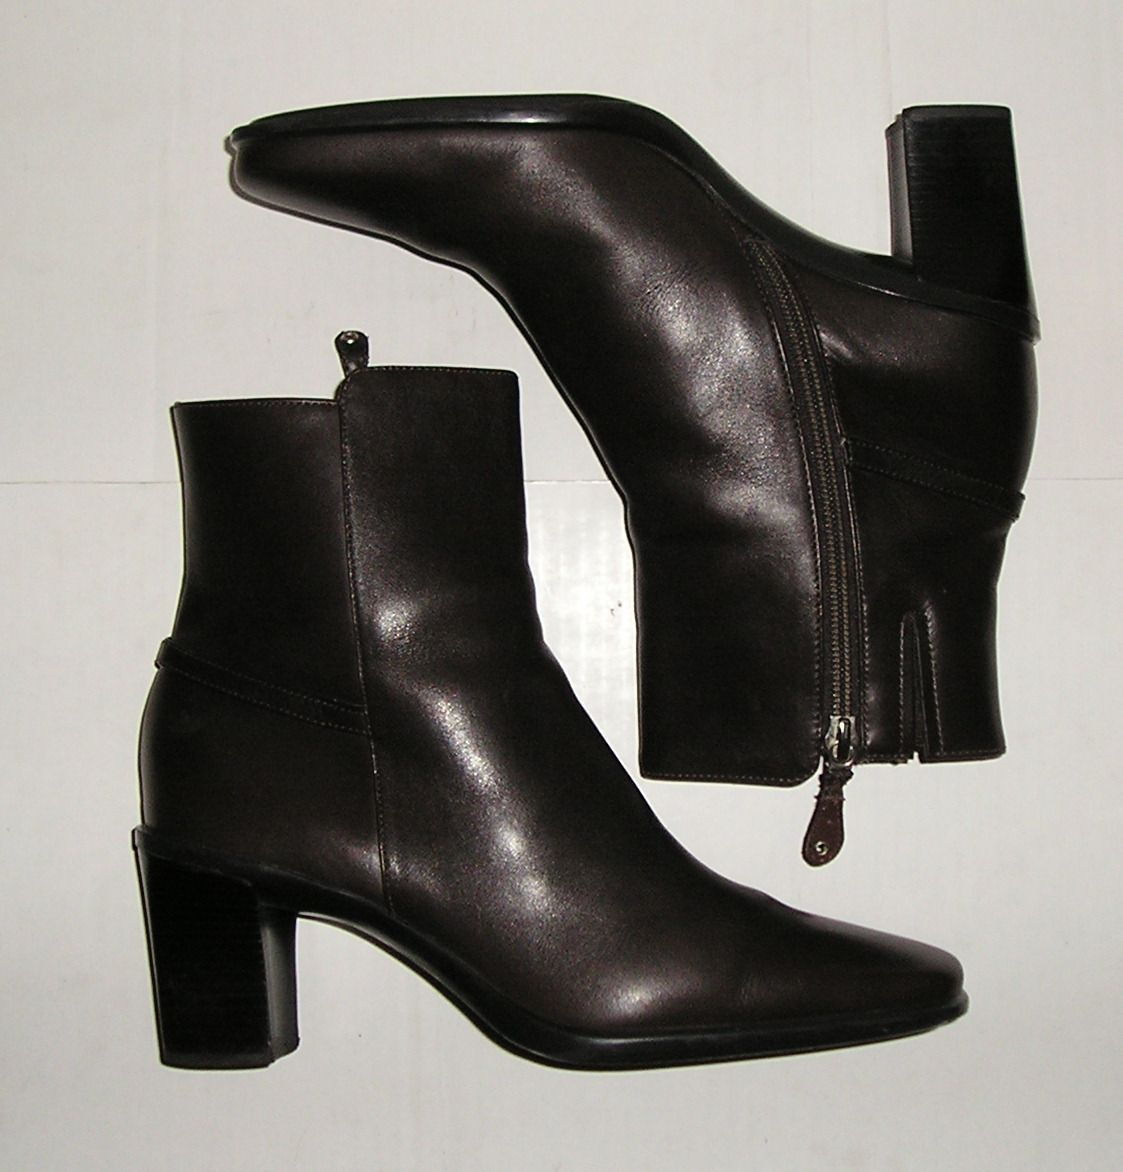 Original Mens Brown Dress Boots - Oasis Amor Fashion